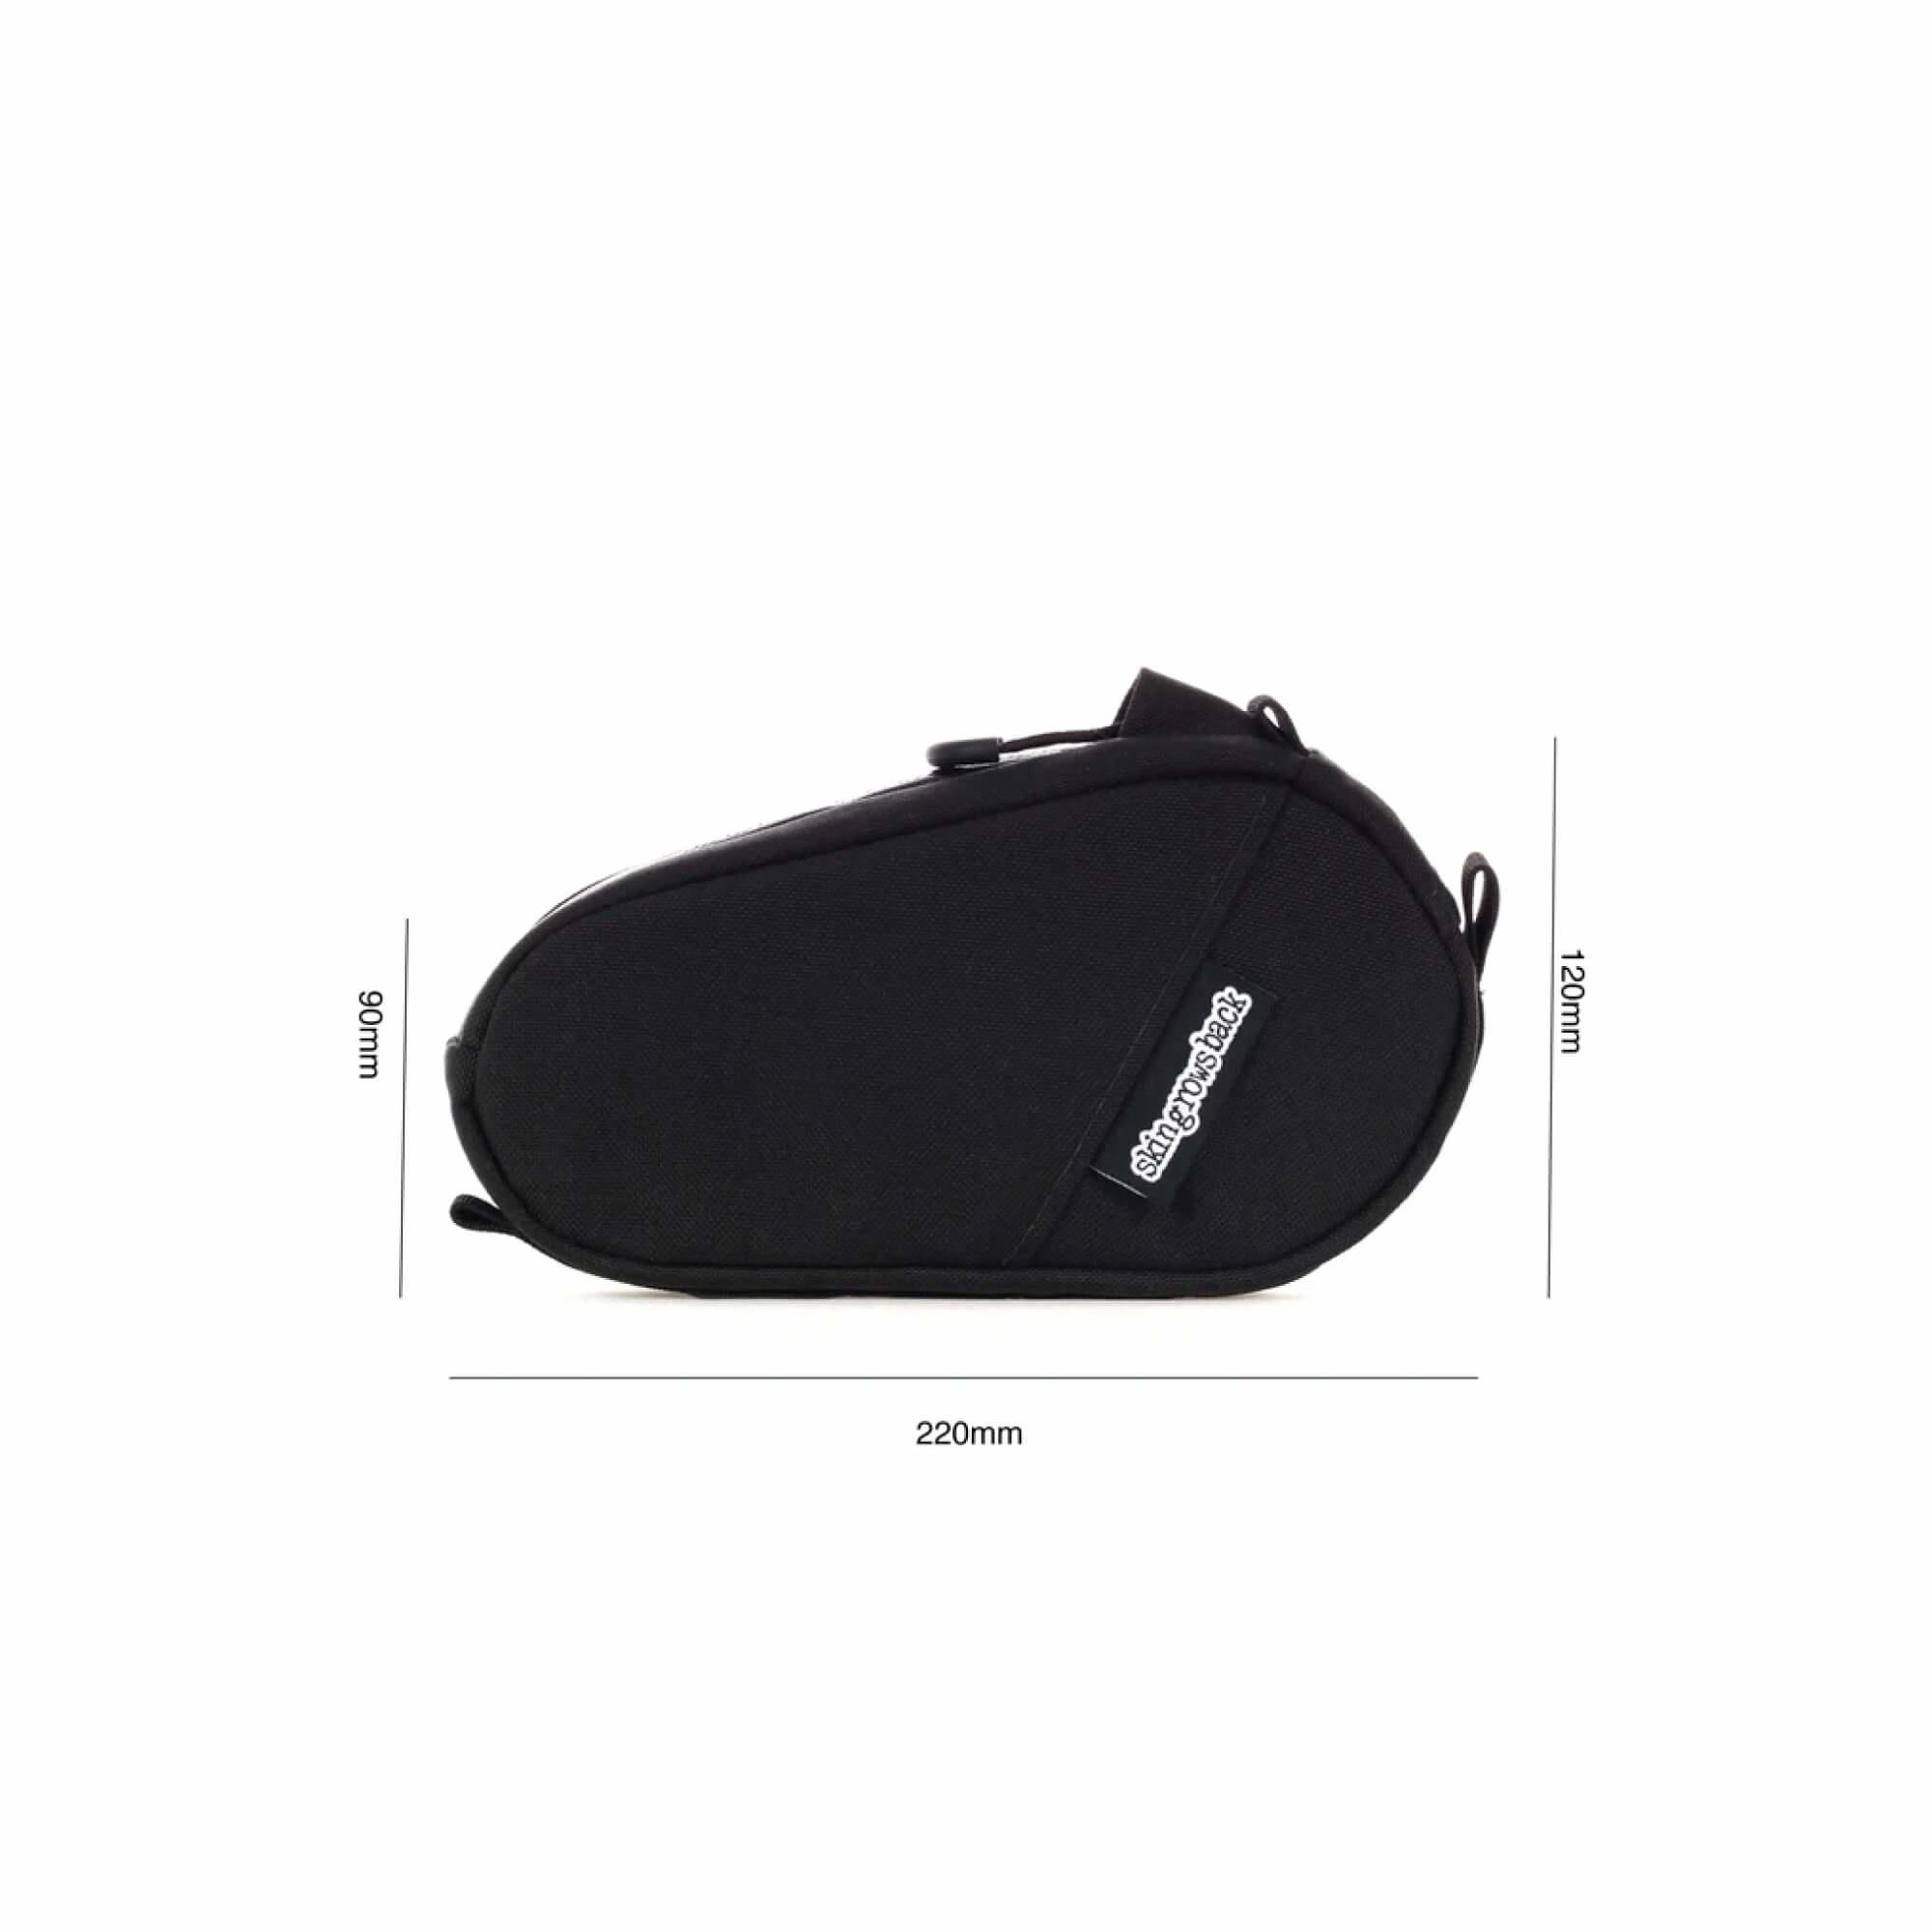 Amigo Top Tube Bag Black-9